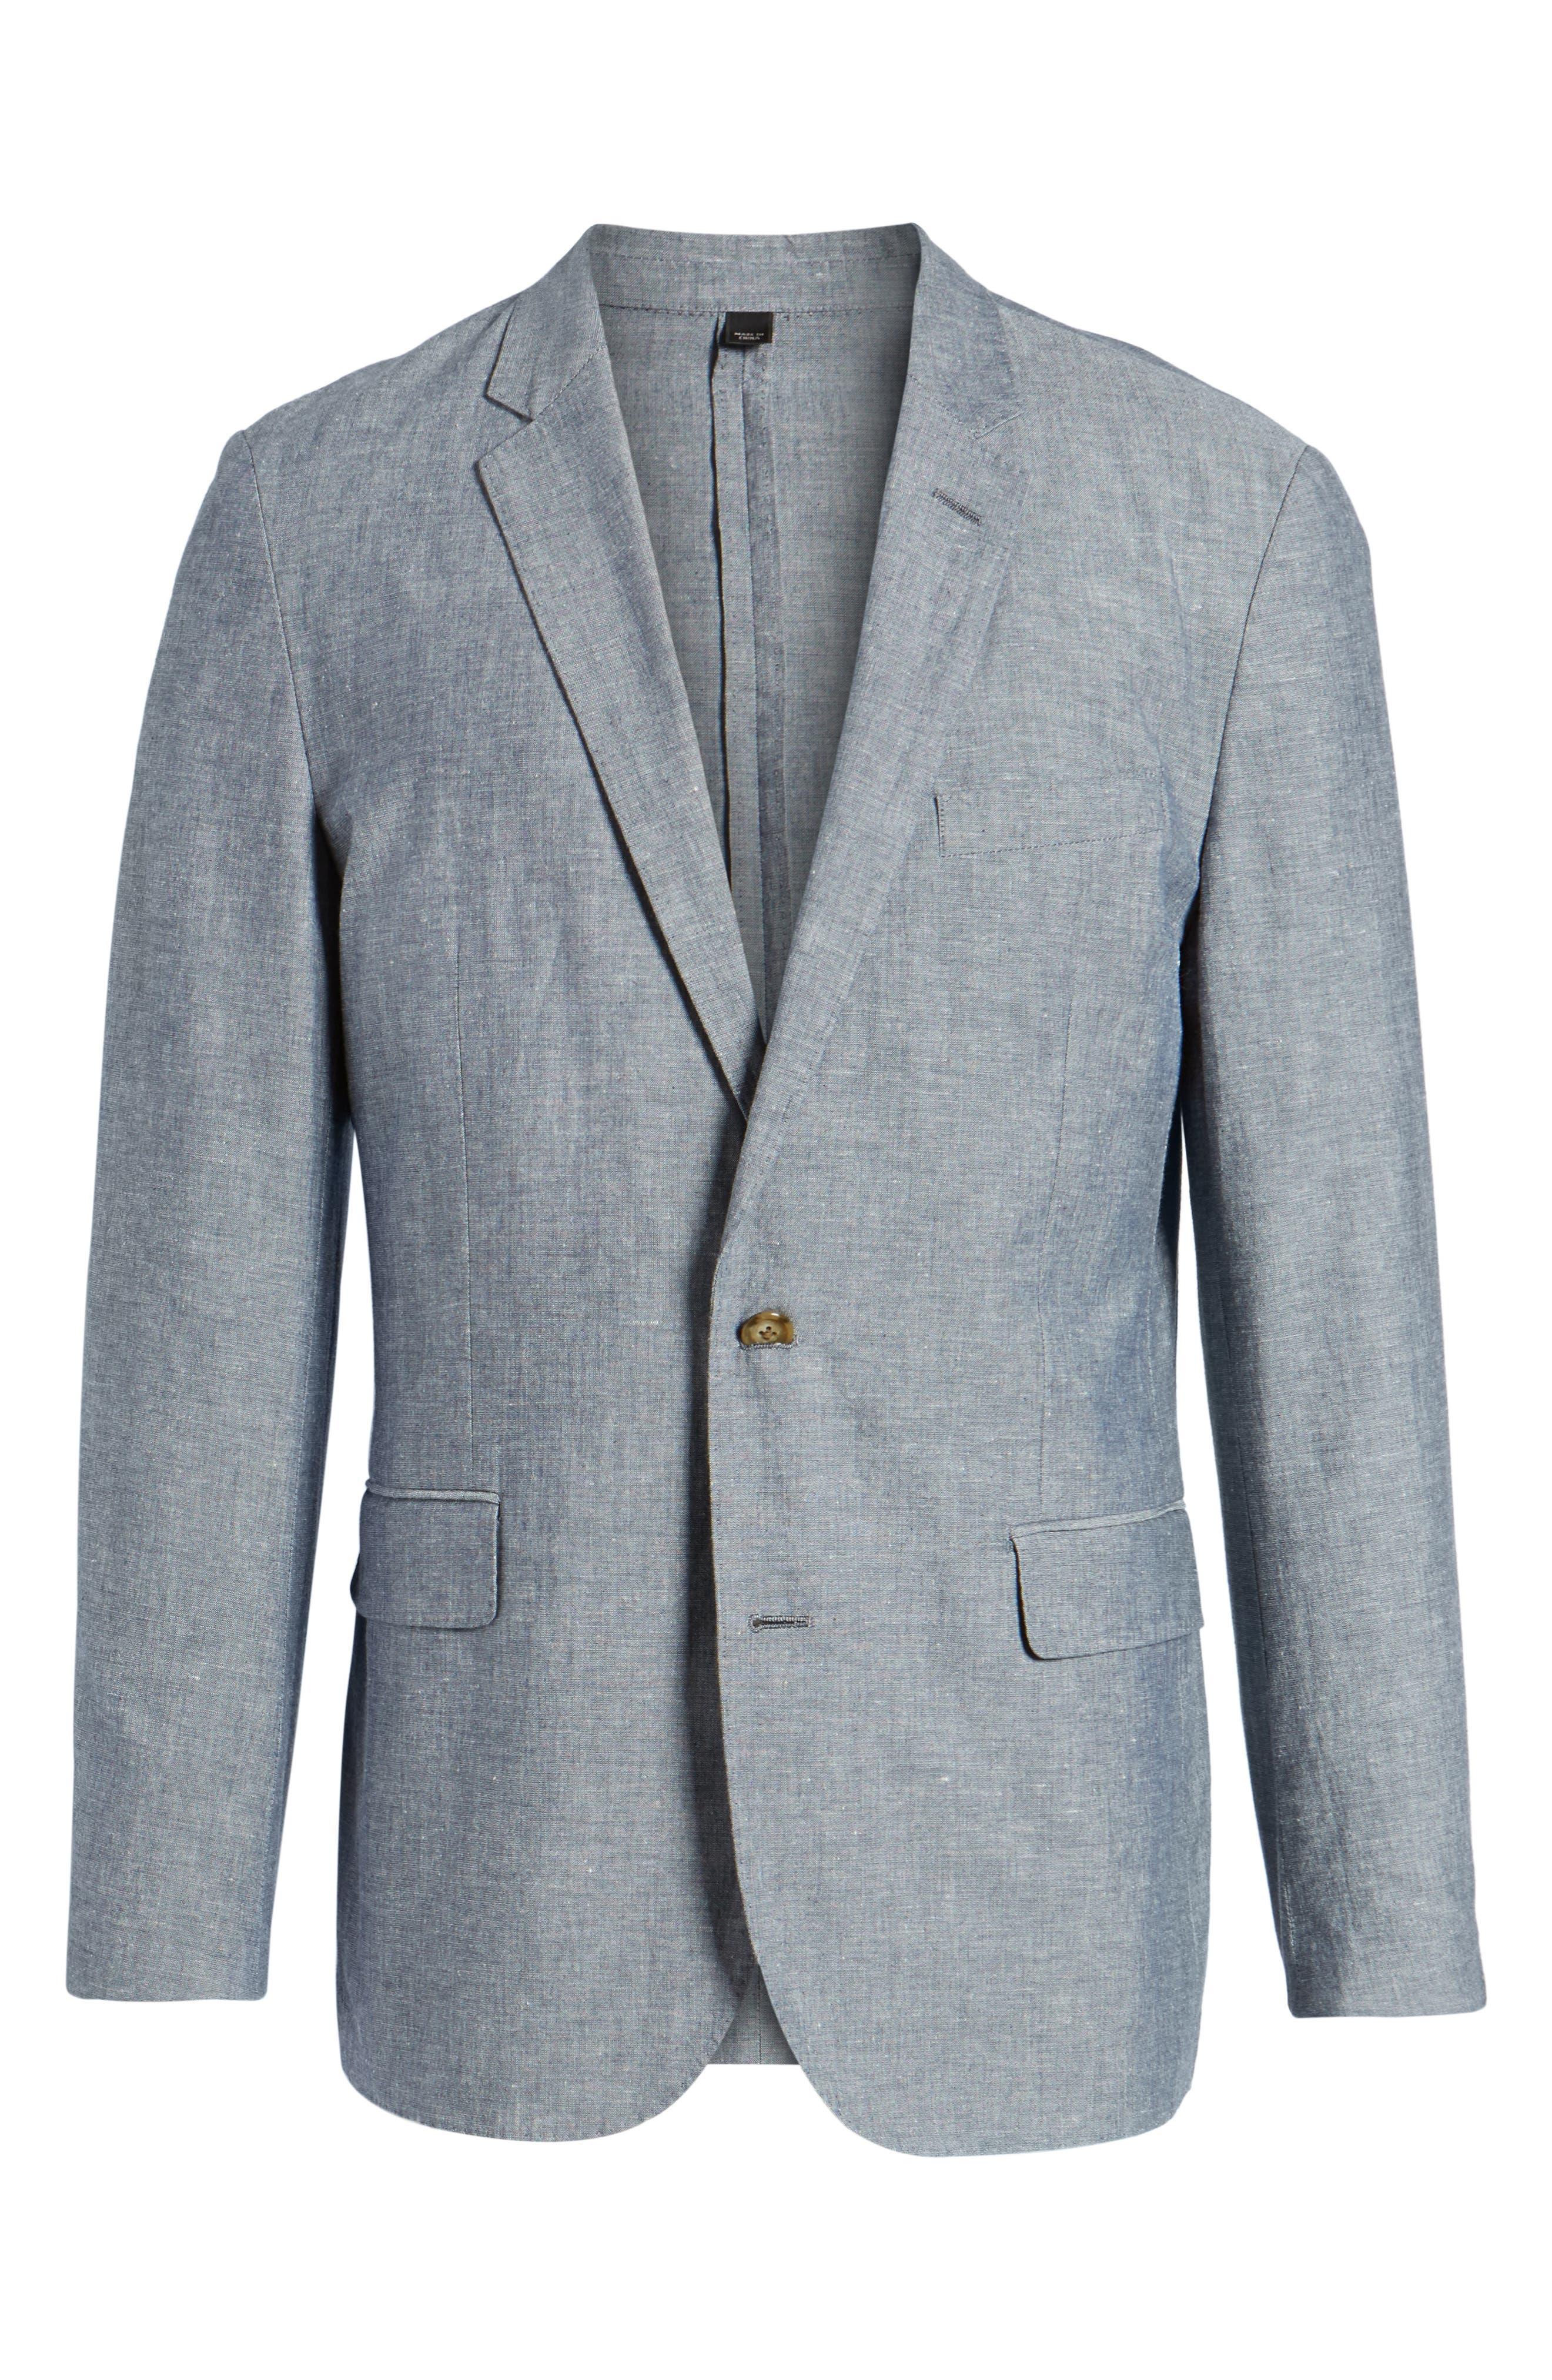 Ludlow Cotton & Linen Blazer,                             Alternate thumbnail 6, color,                             Deep Water Blue